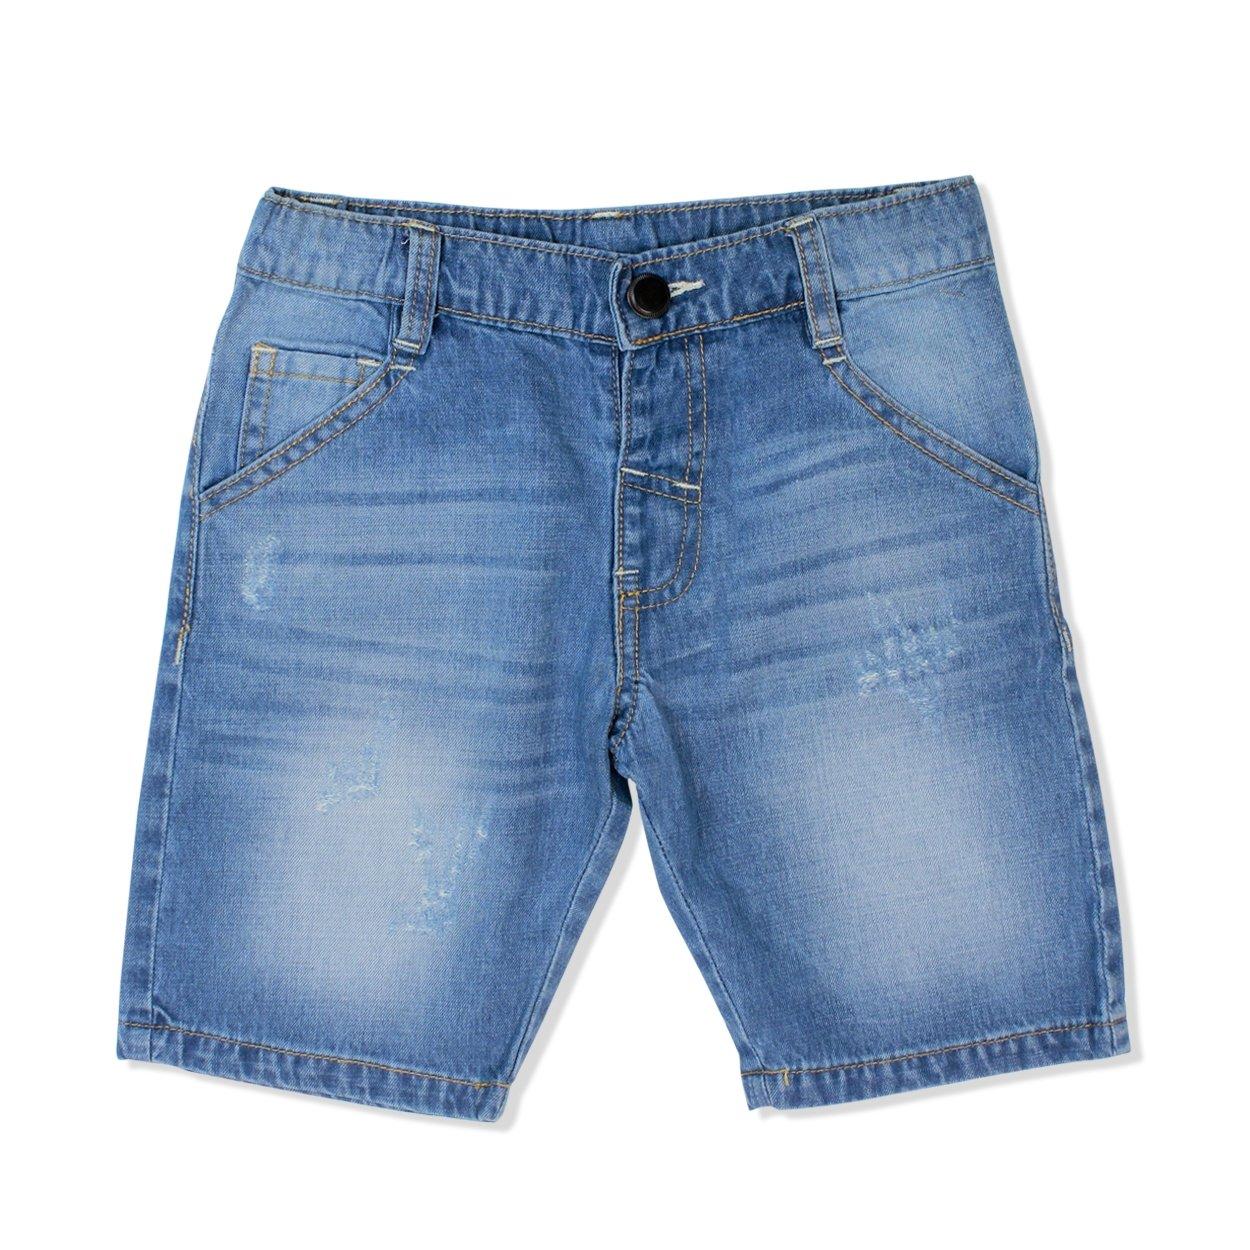 Quần Jeans bé trai ngắn B017003 (2T, Xanh jean)